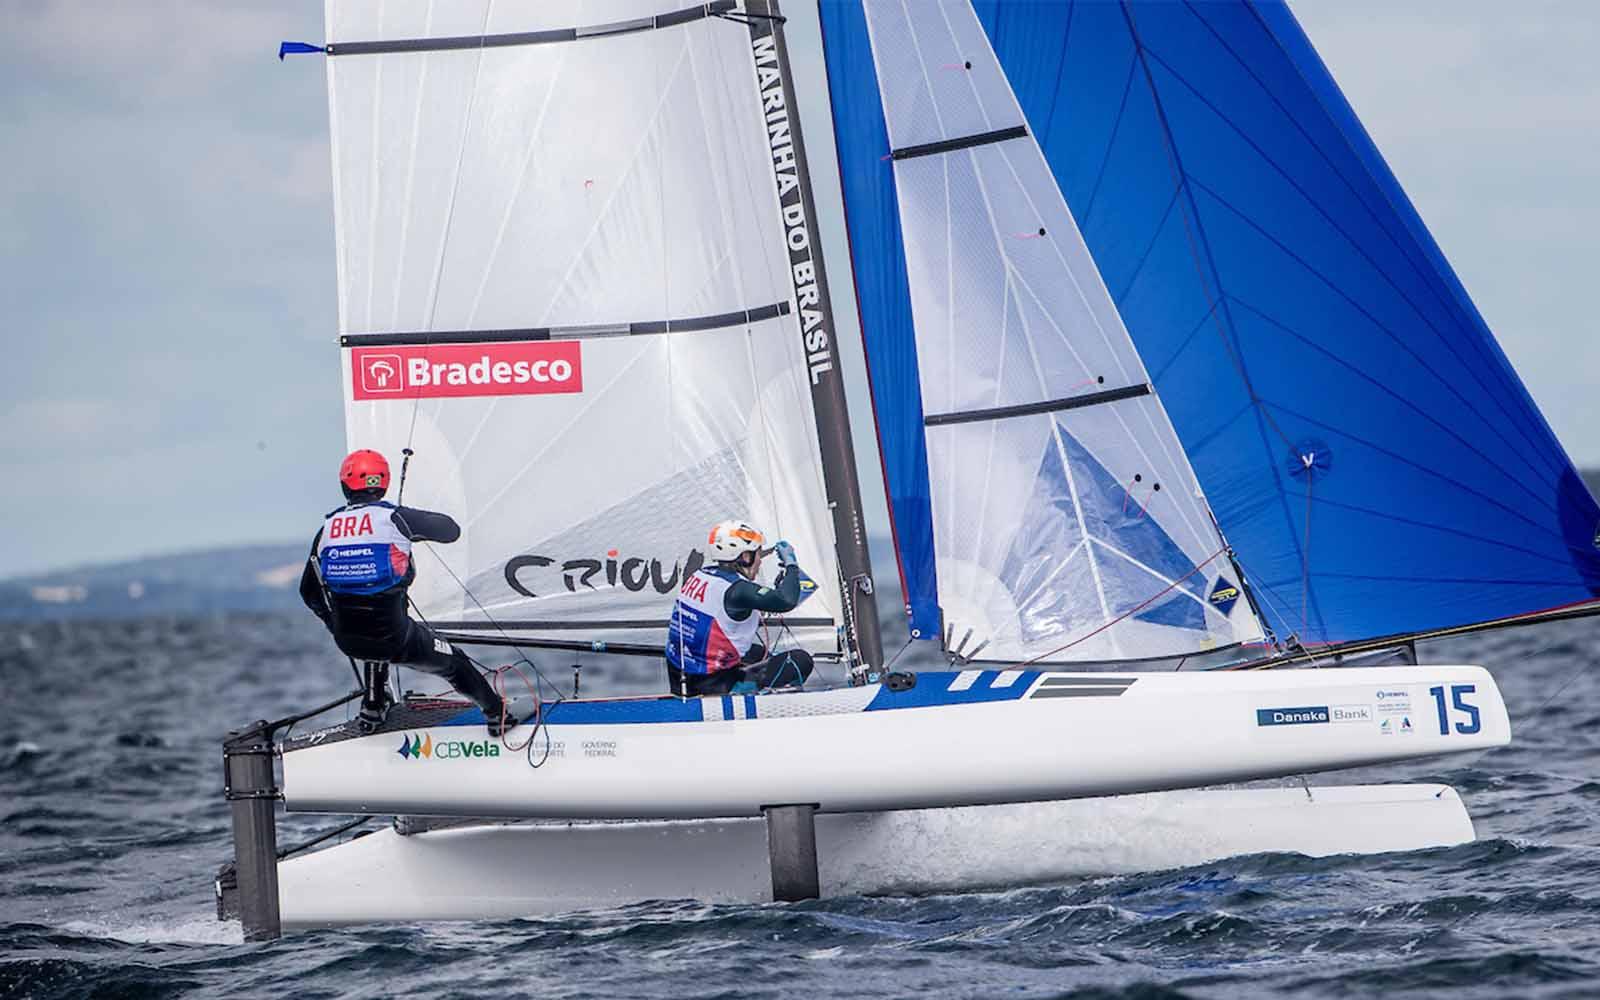 Mundial-Samuel Albrecht e Gabriela Nicolino-Jesus Renedo-Sailing Energy-boatshopping